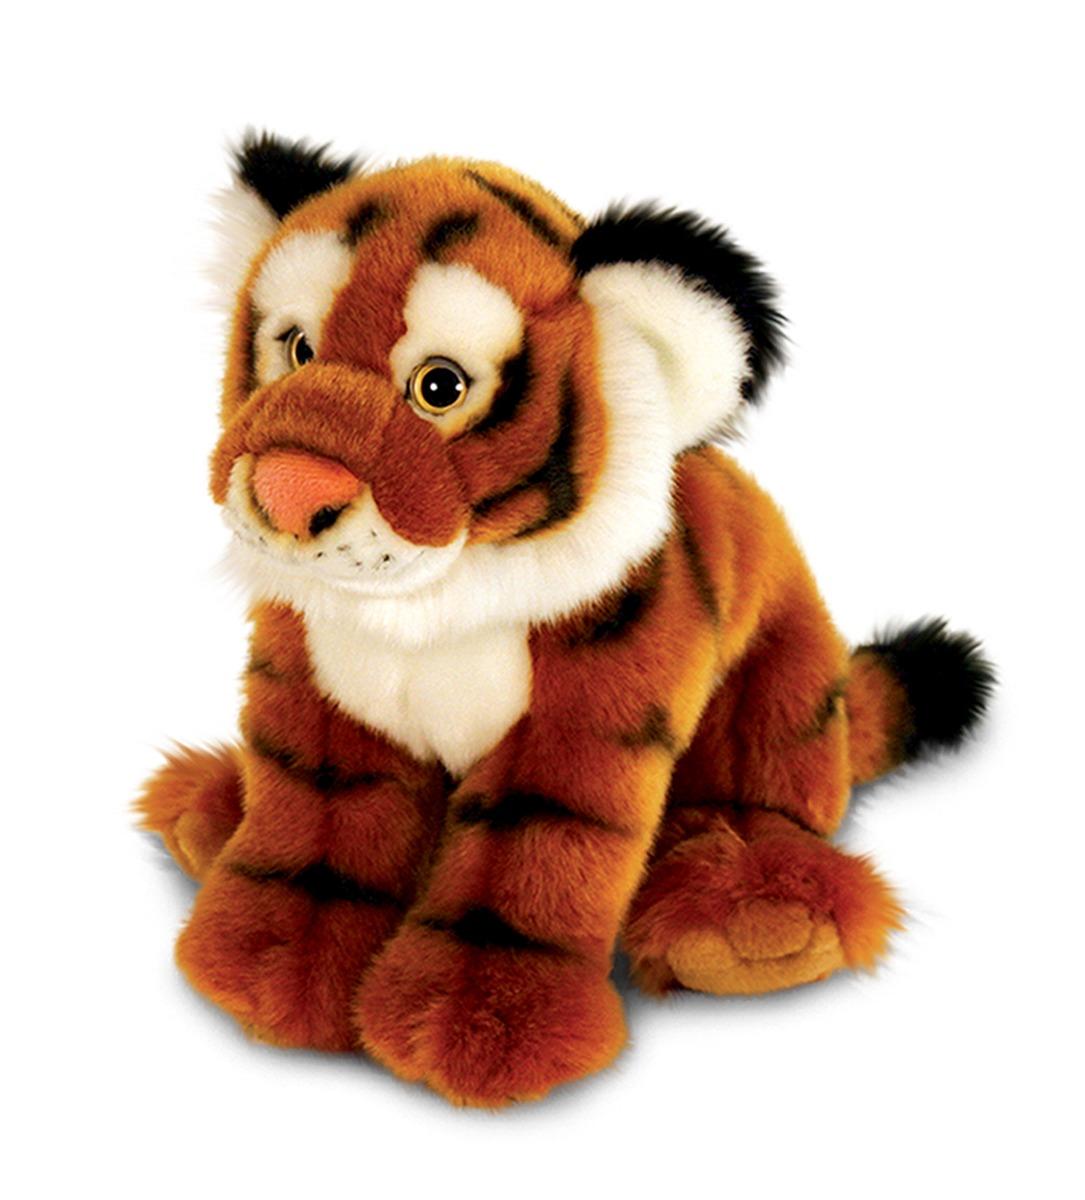 Peluche De Tigre 33cm Recostado Keel Toys Vida Silvestre